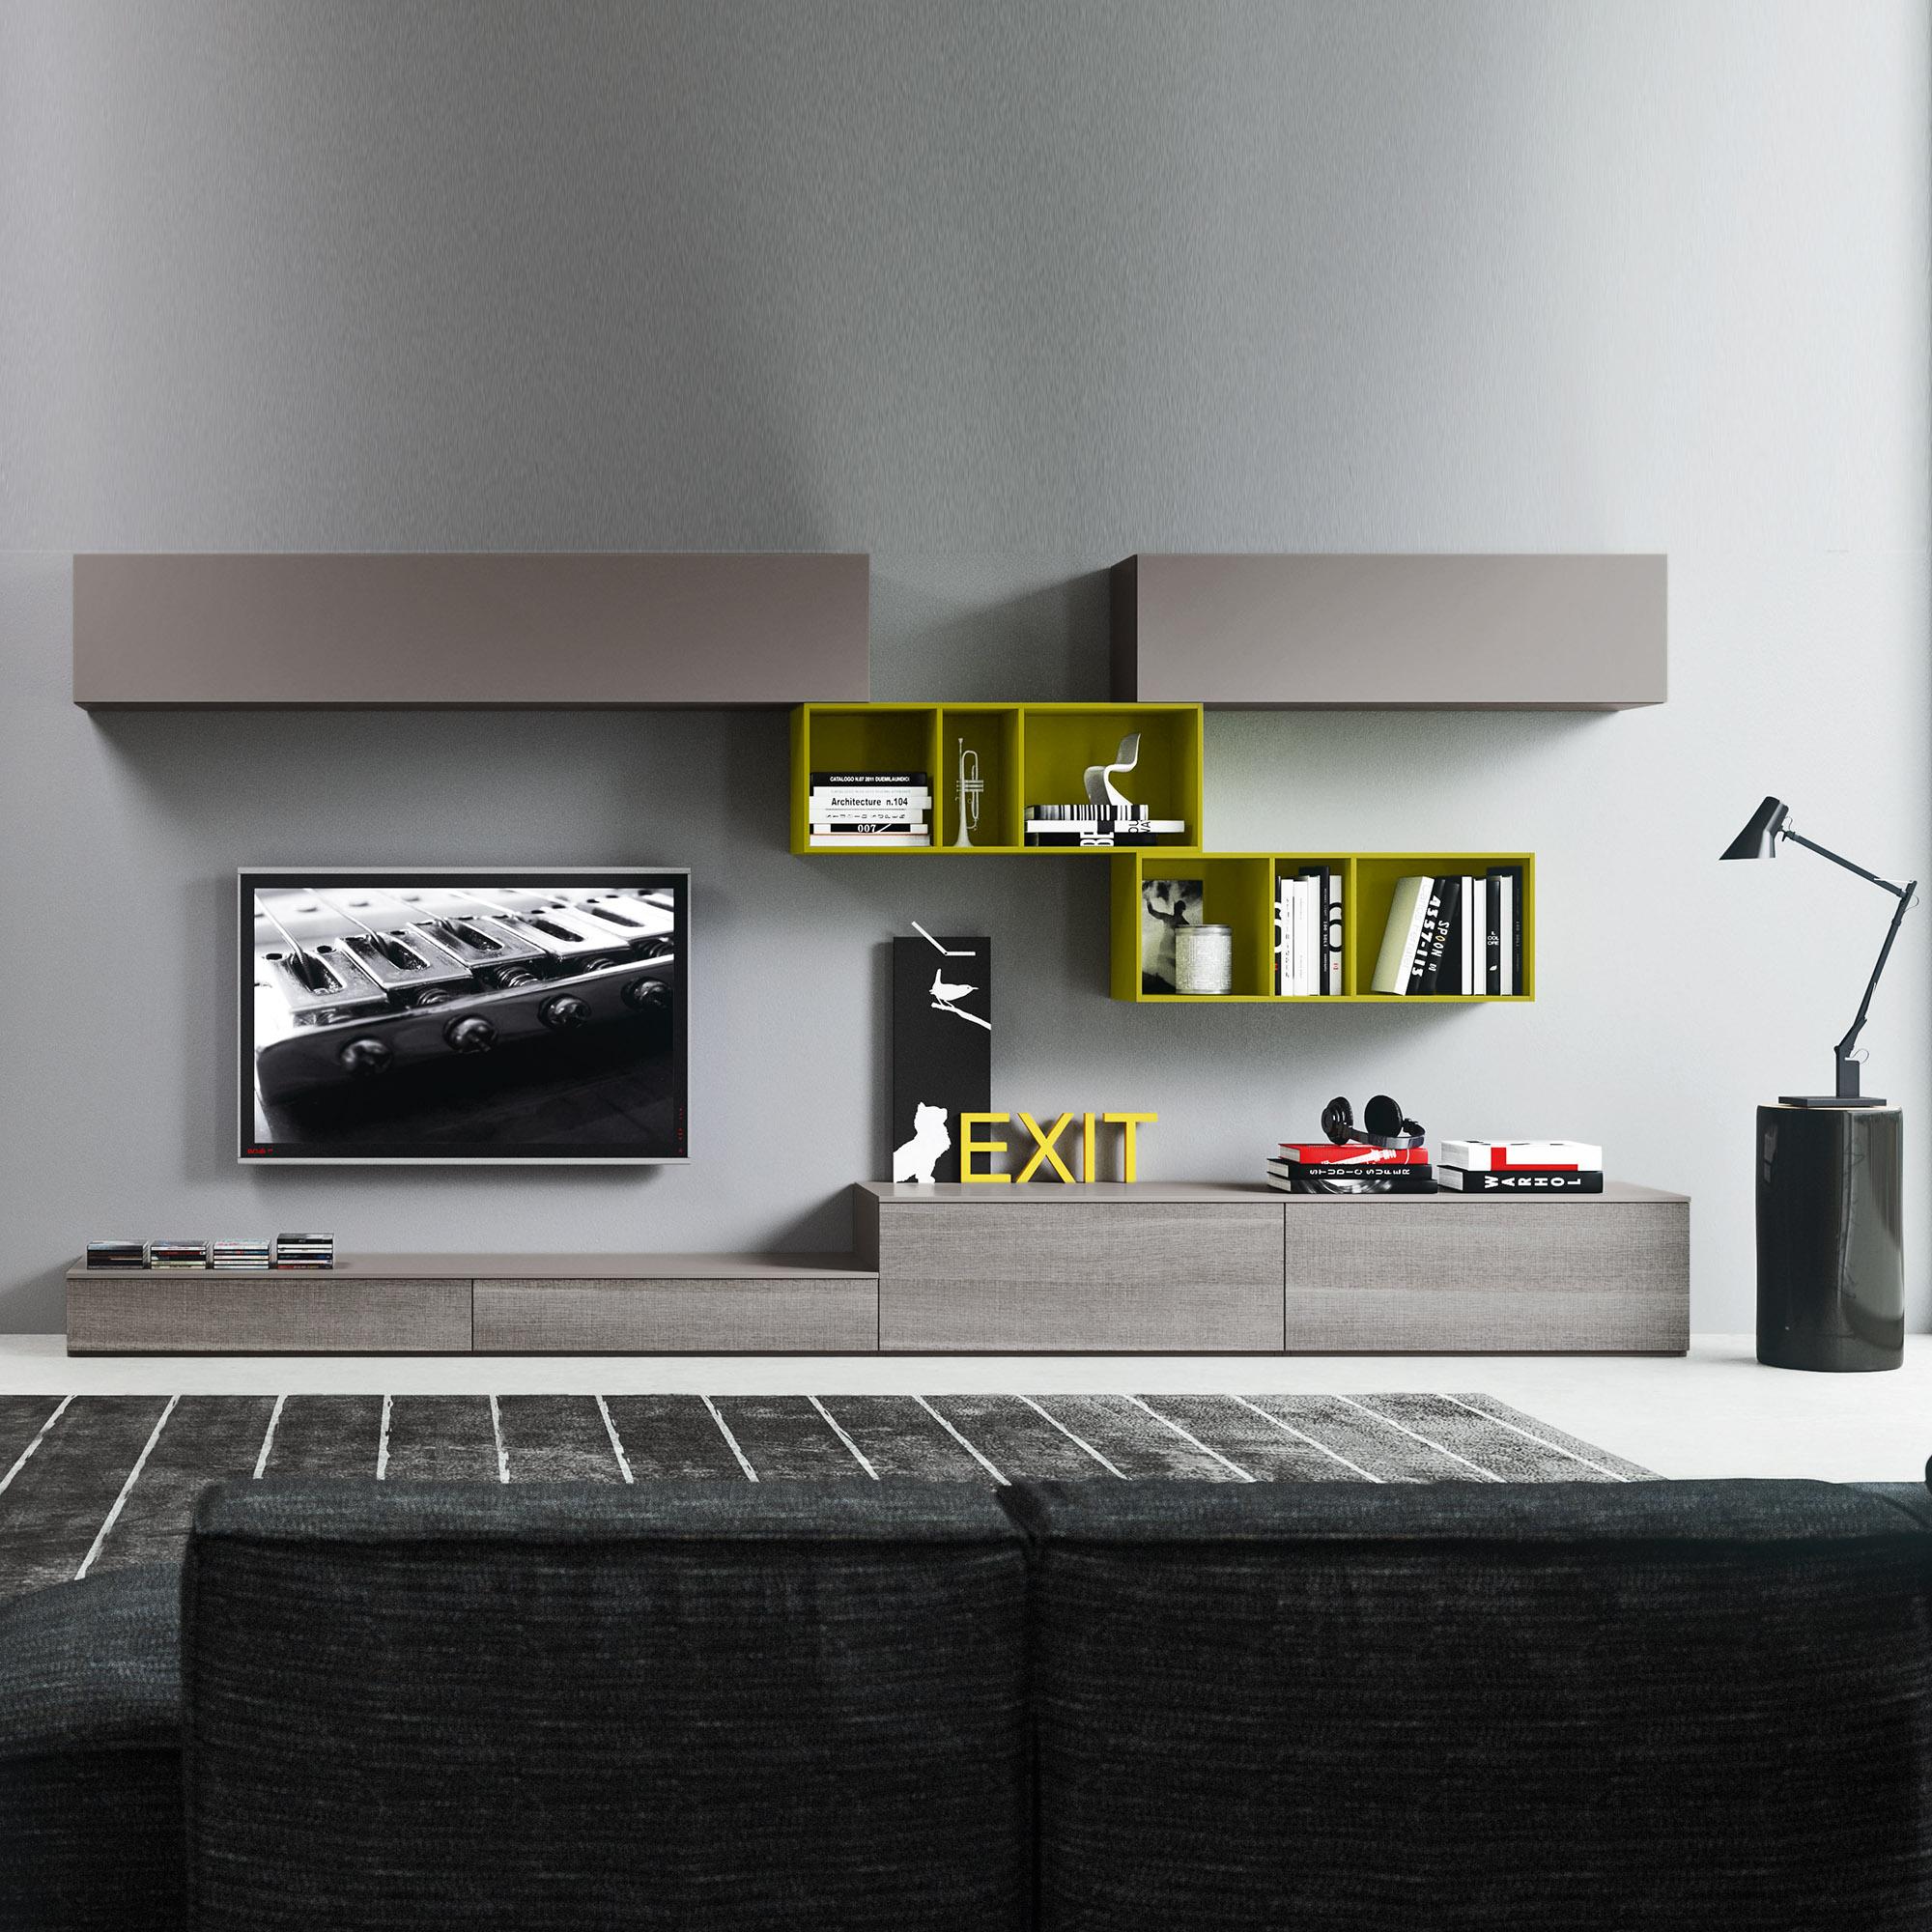 italian-contemporary-furniture-composition-10-bookcase-tv-unit-media-stand-lounge-living-room-by-siluetto-siloma.jpg